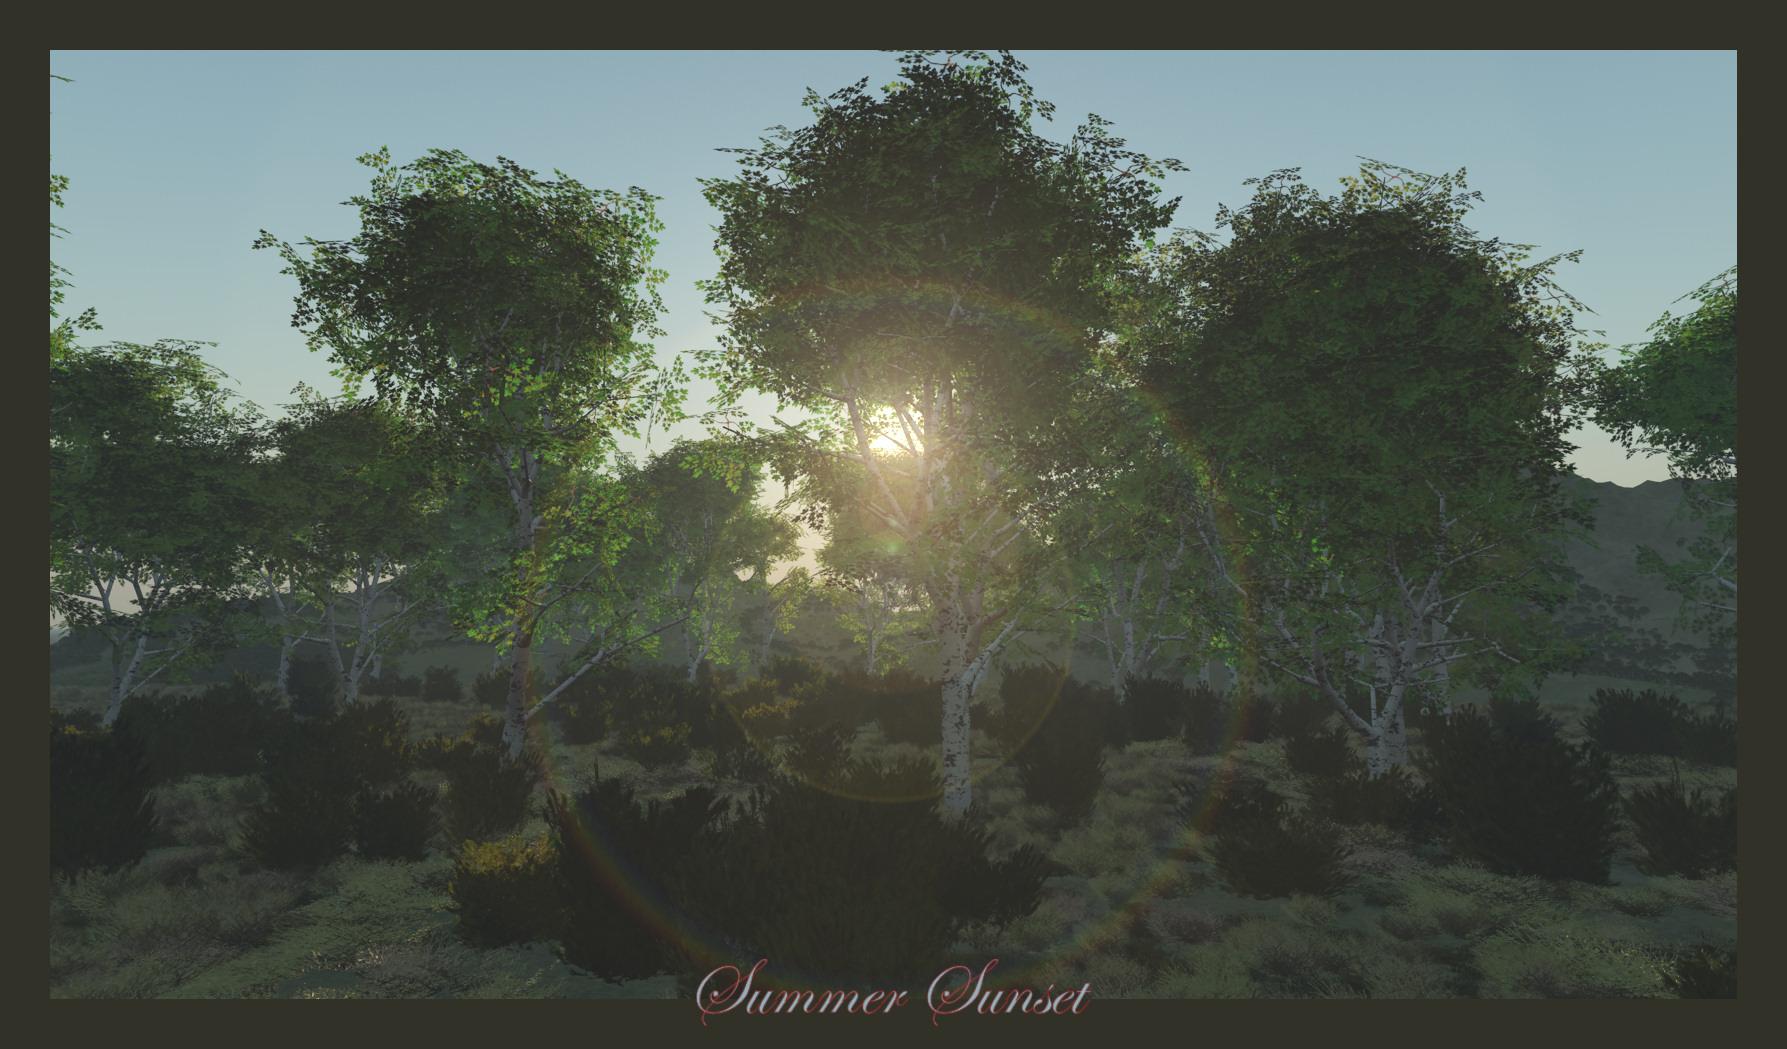 Summer Sunet by jbjdesigns